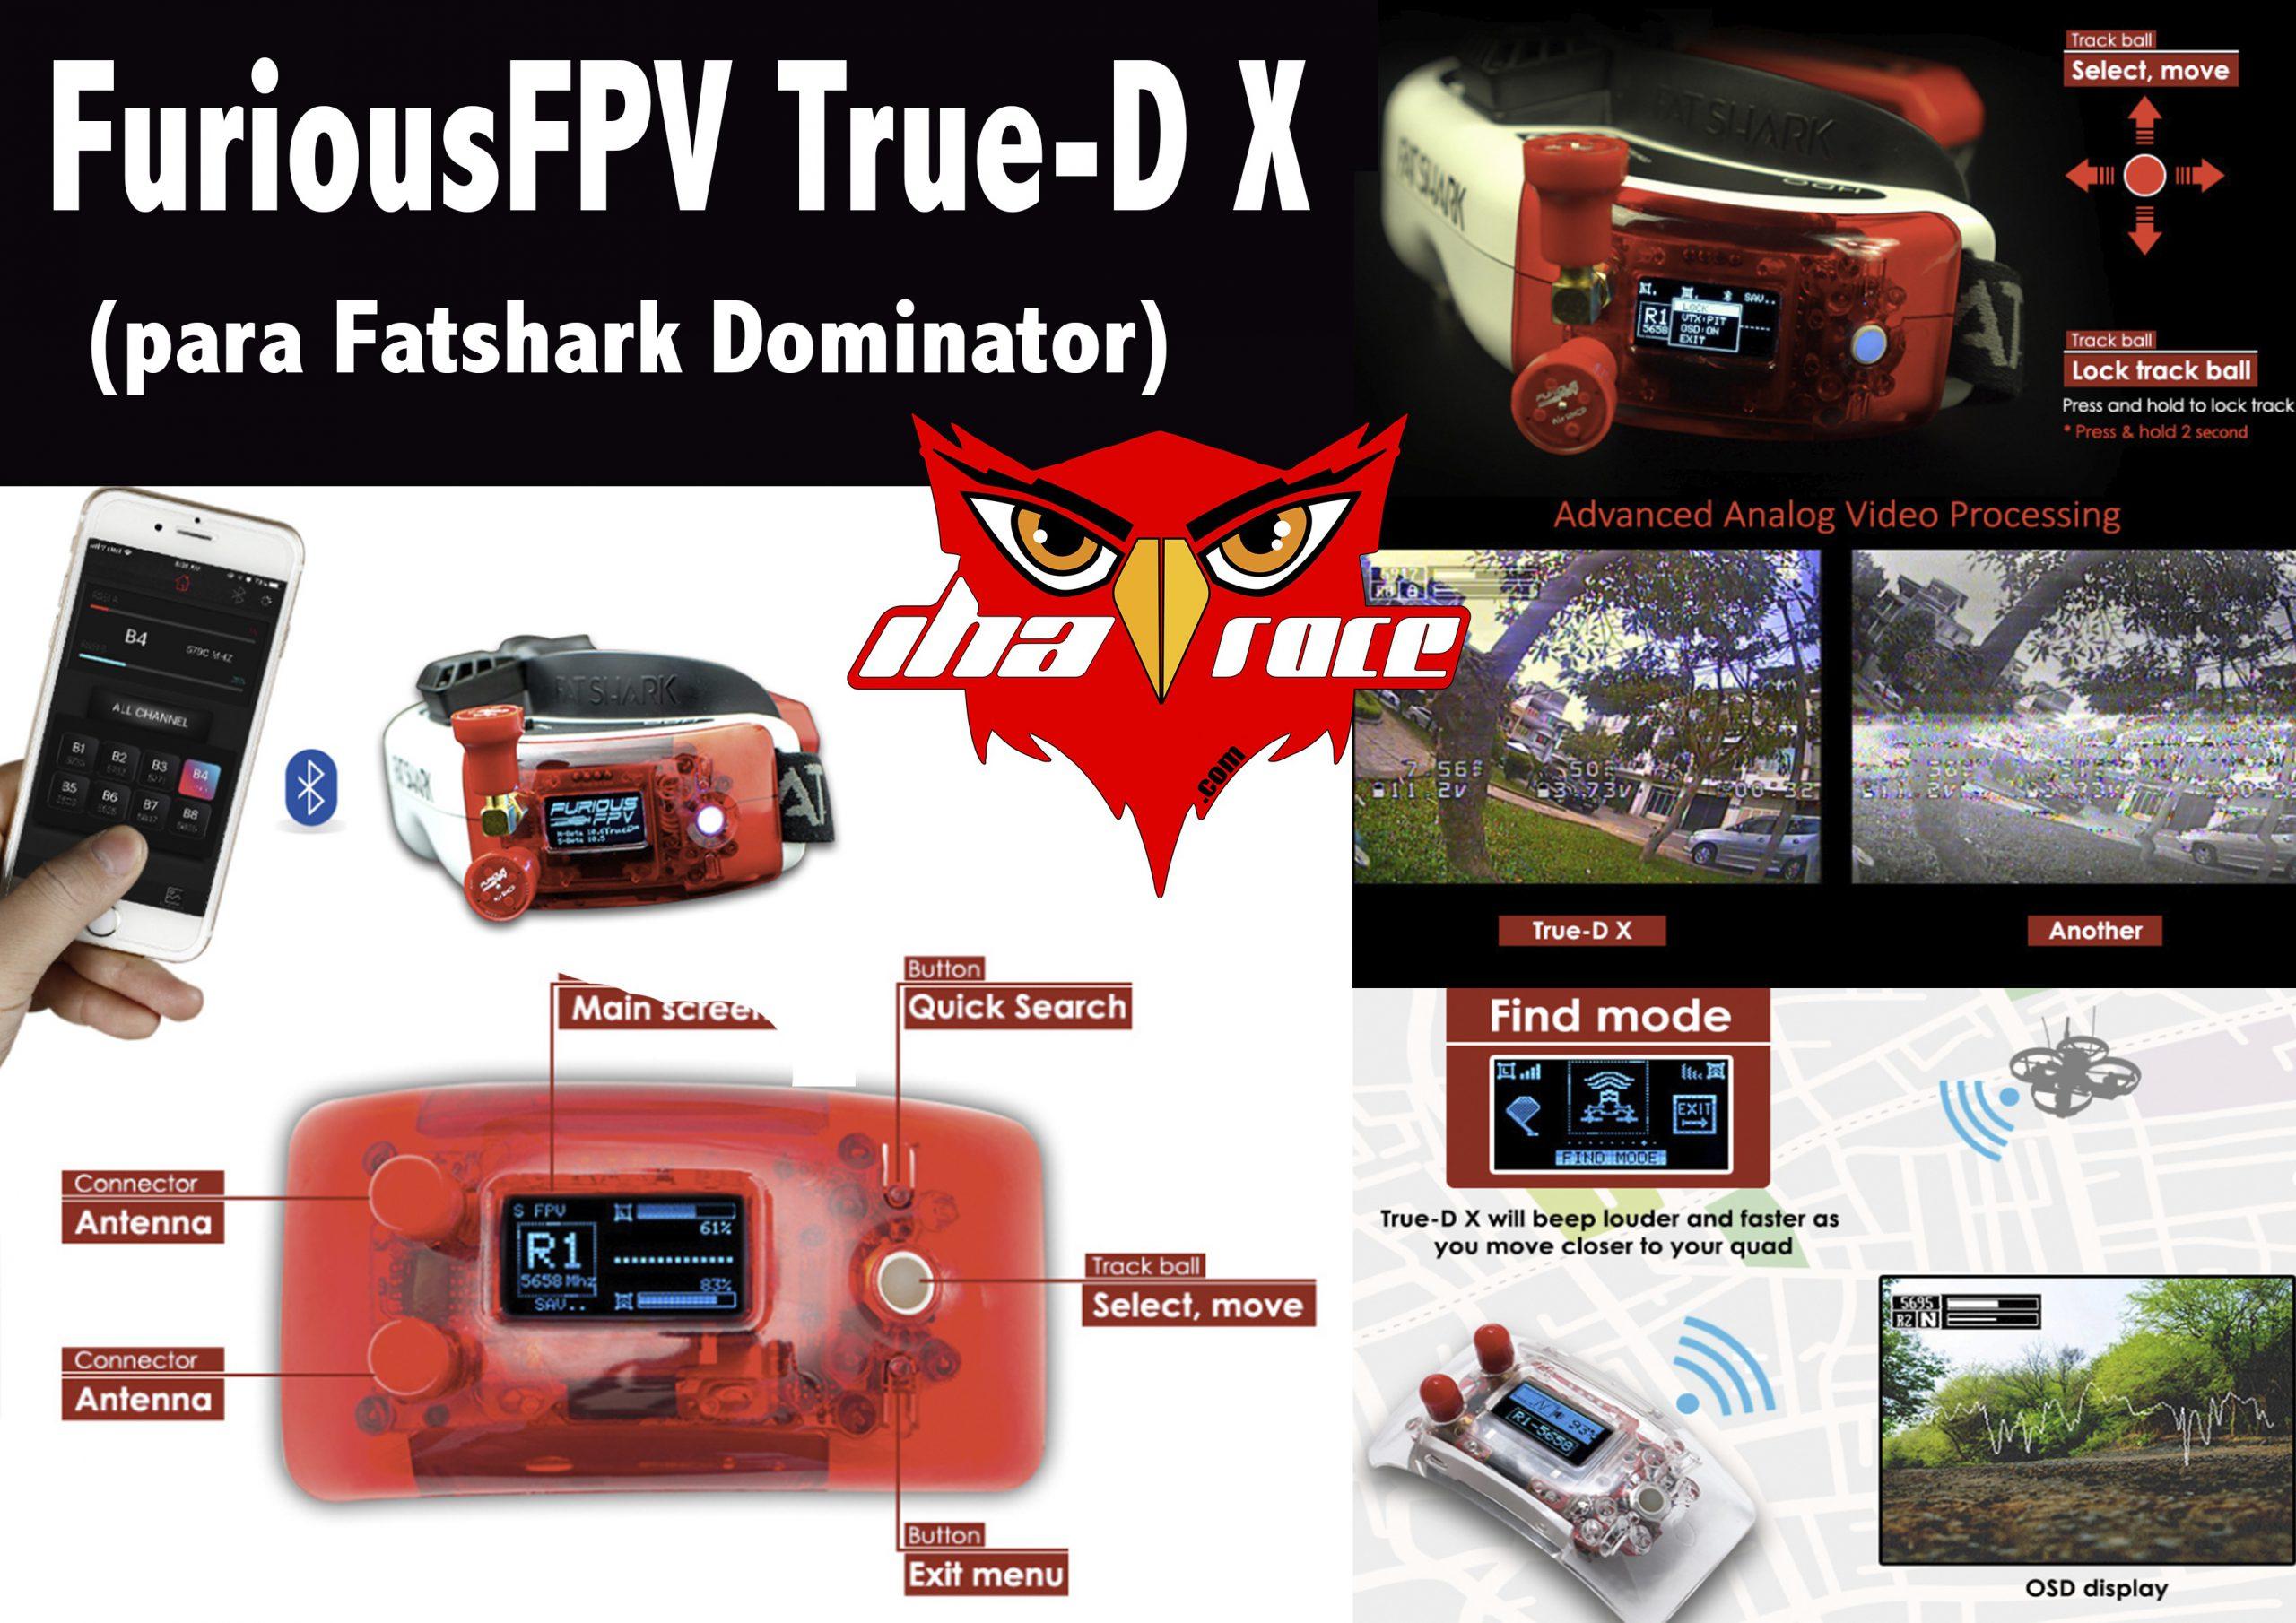 FuriousFPV True-D X (para Fatshark Dominator) - Rojo